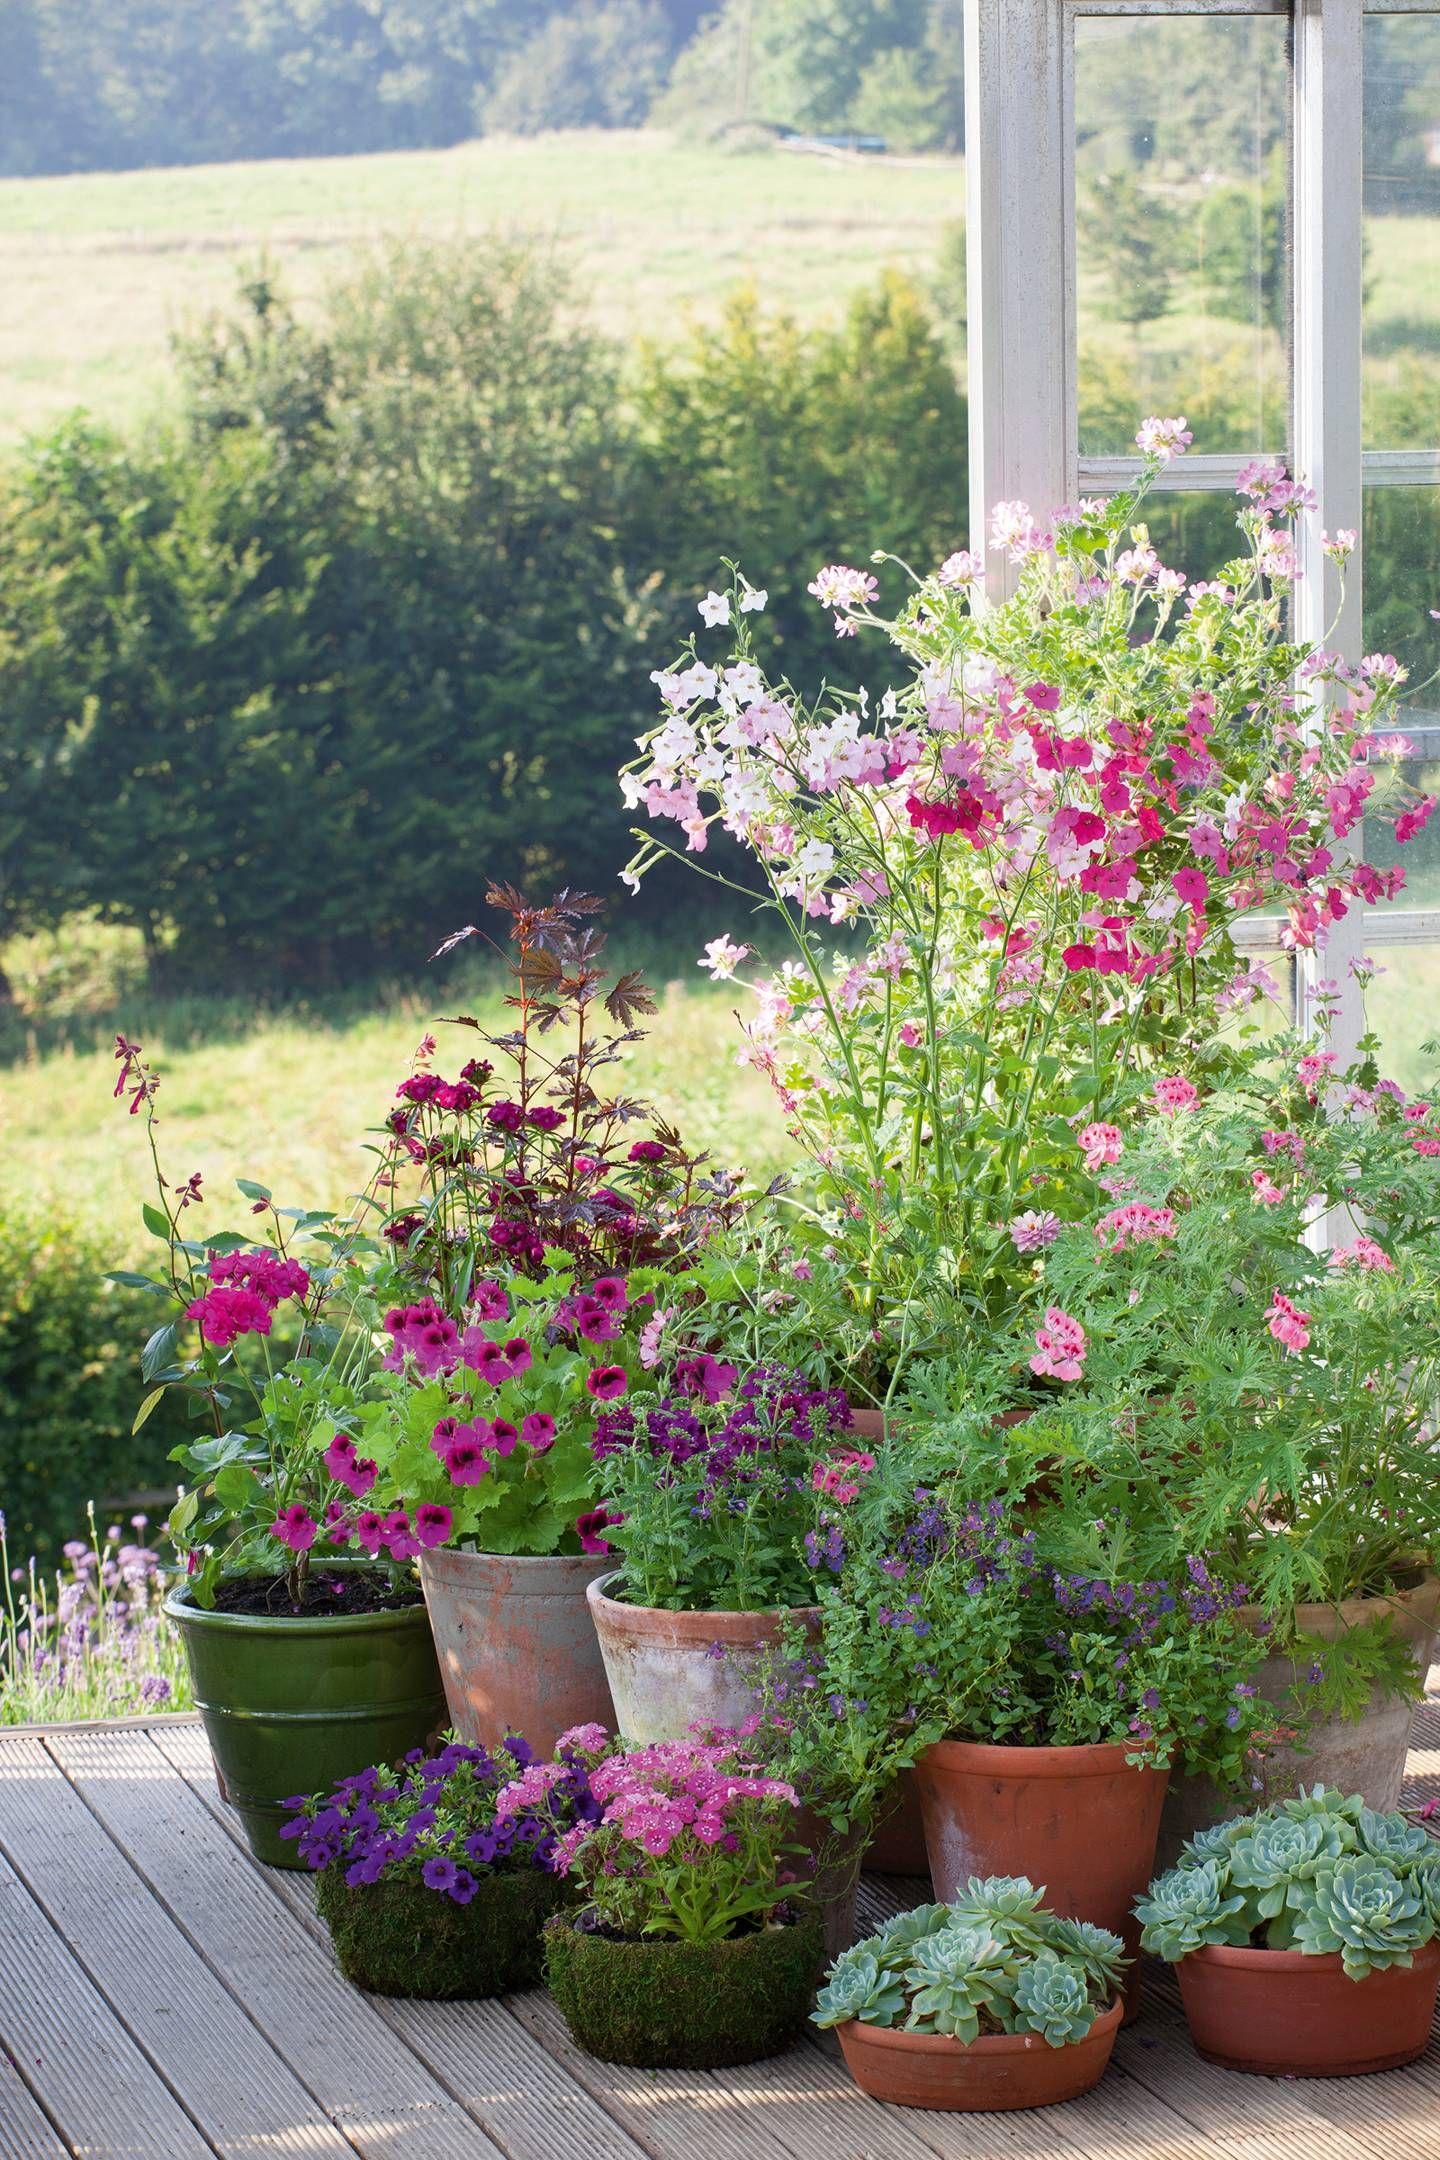 23 decorating garden pots ideas